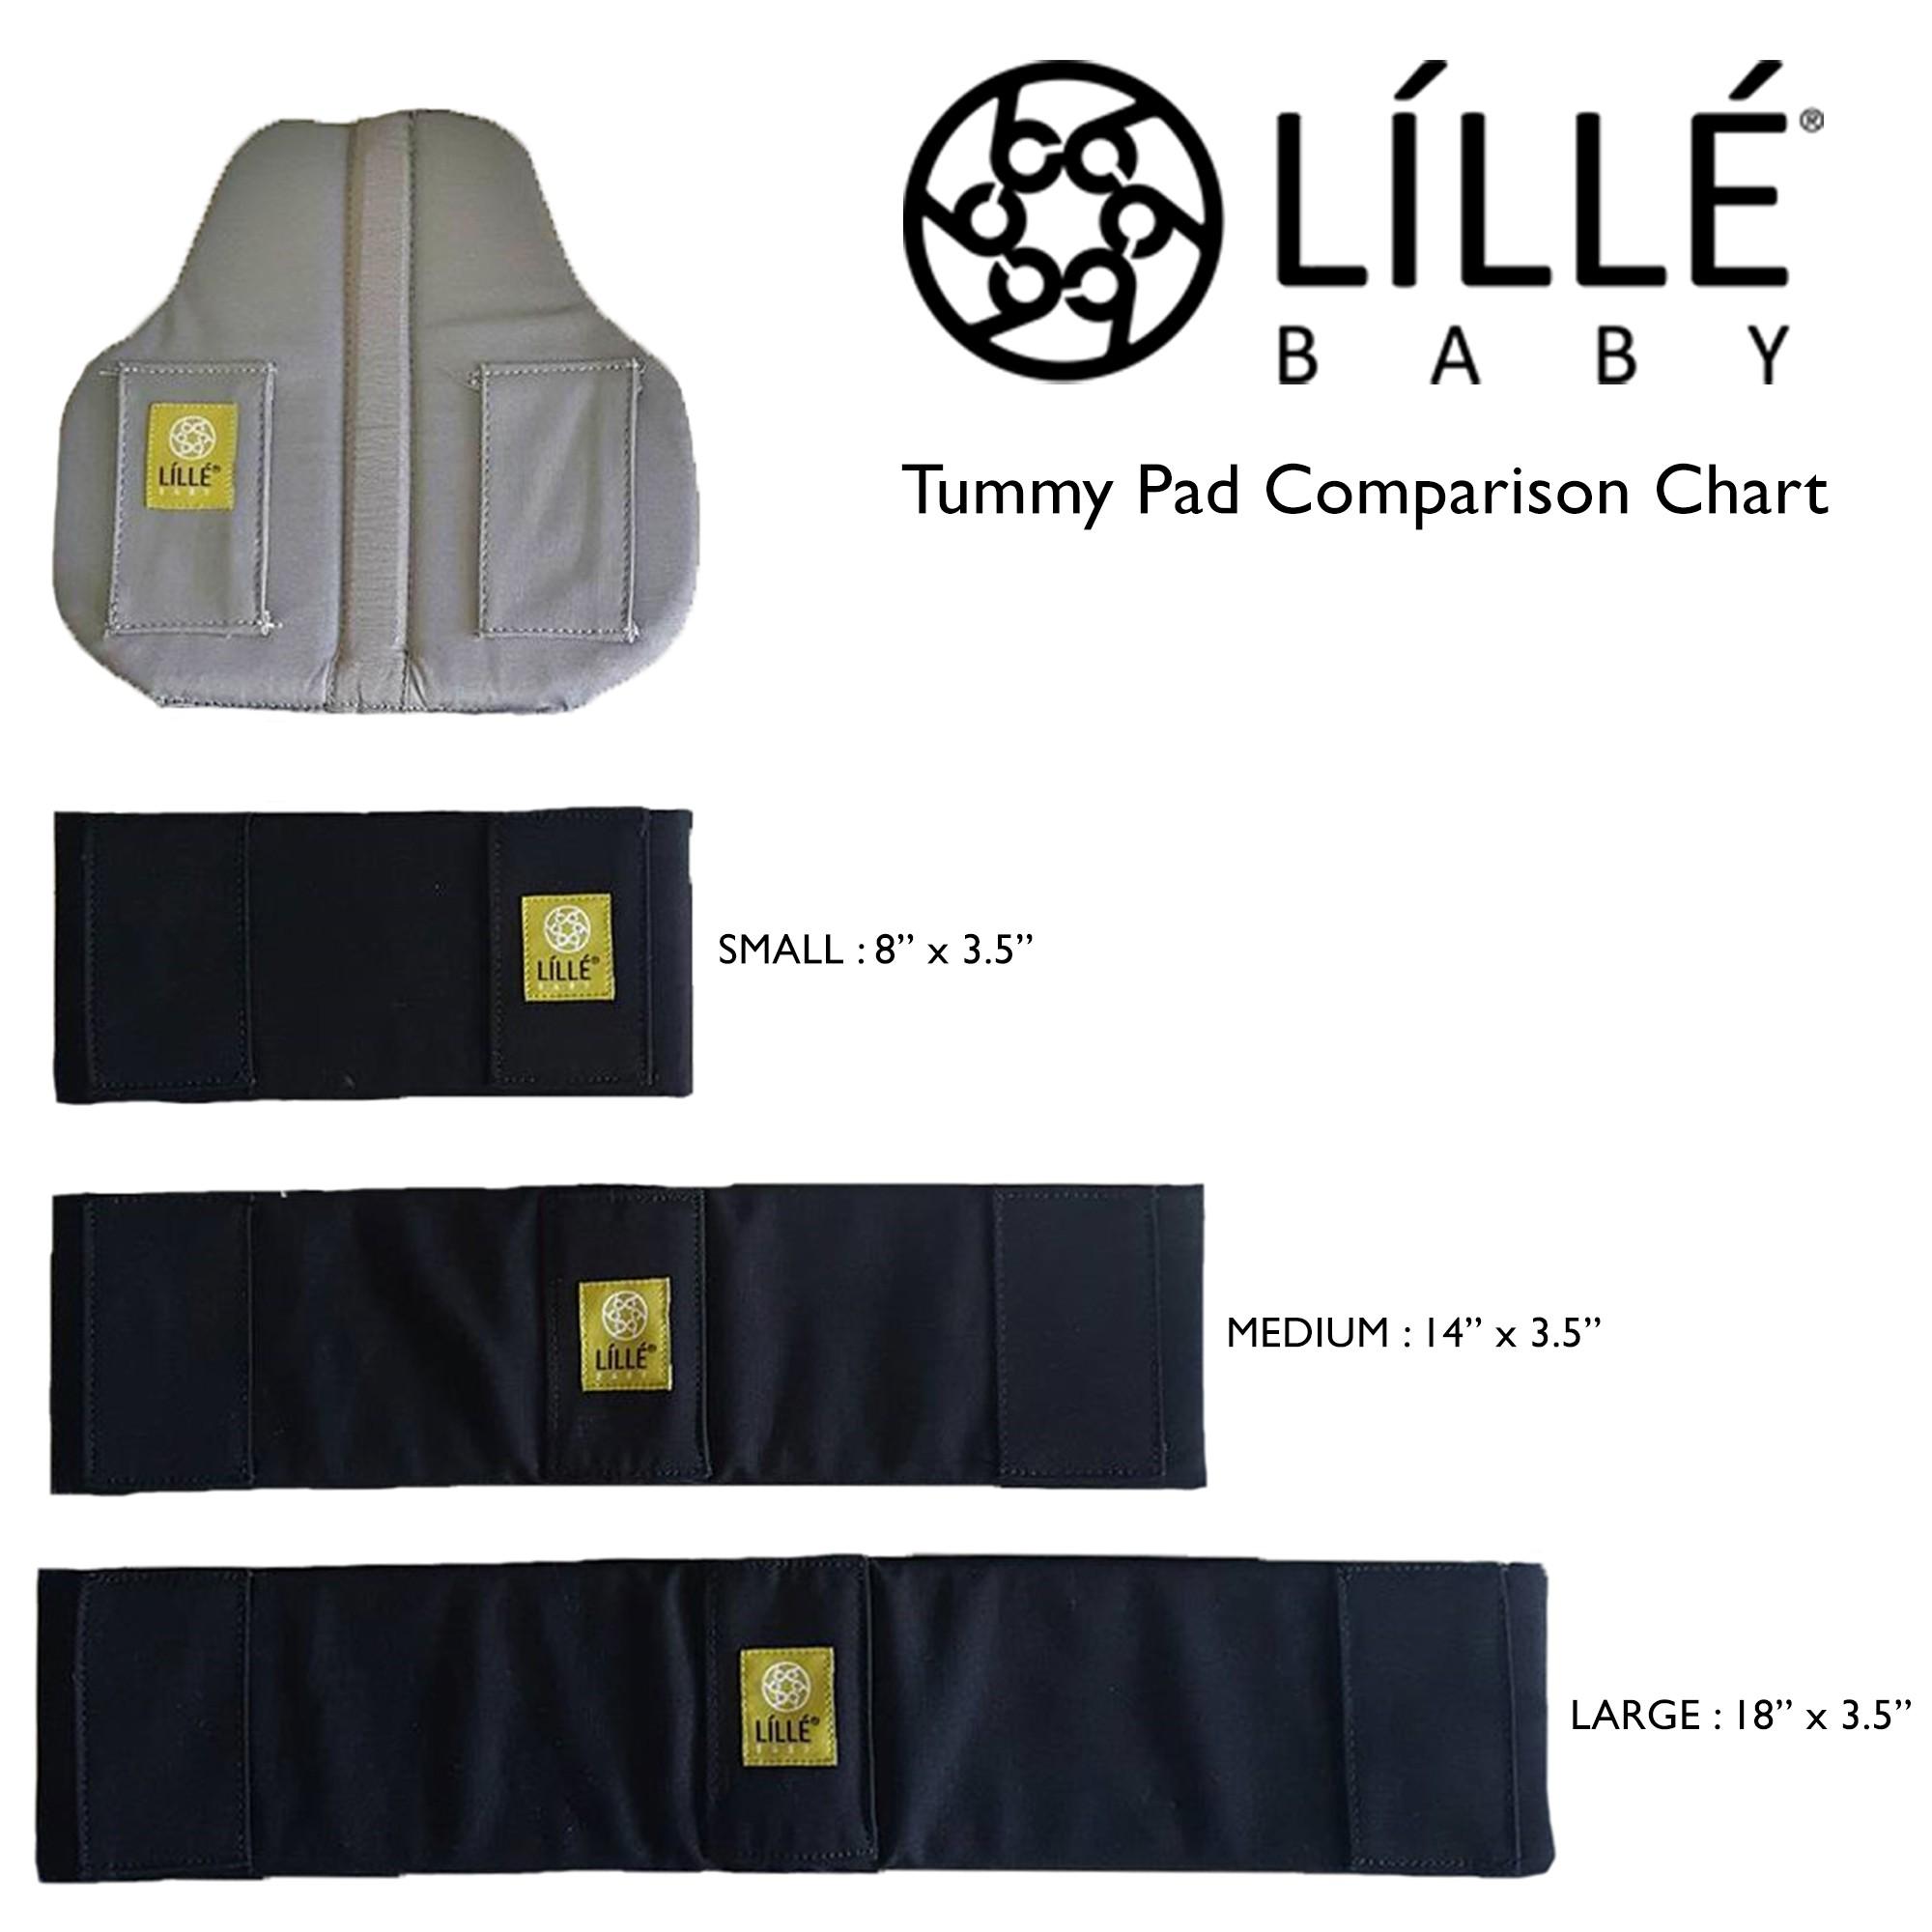 Lillebaby Tummy Pad